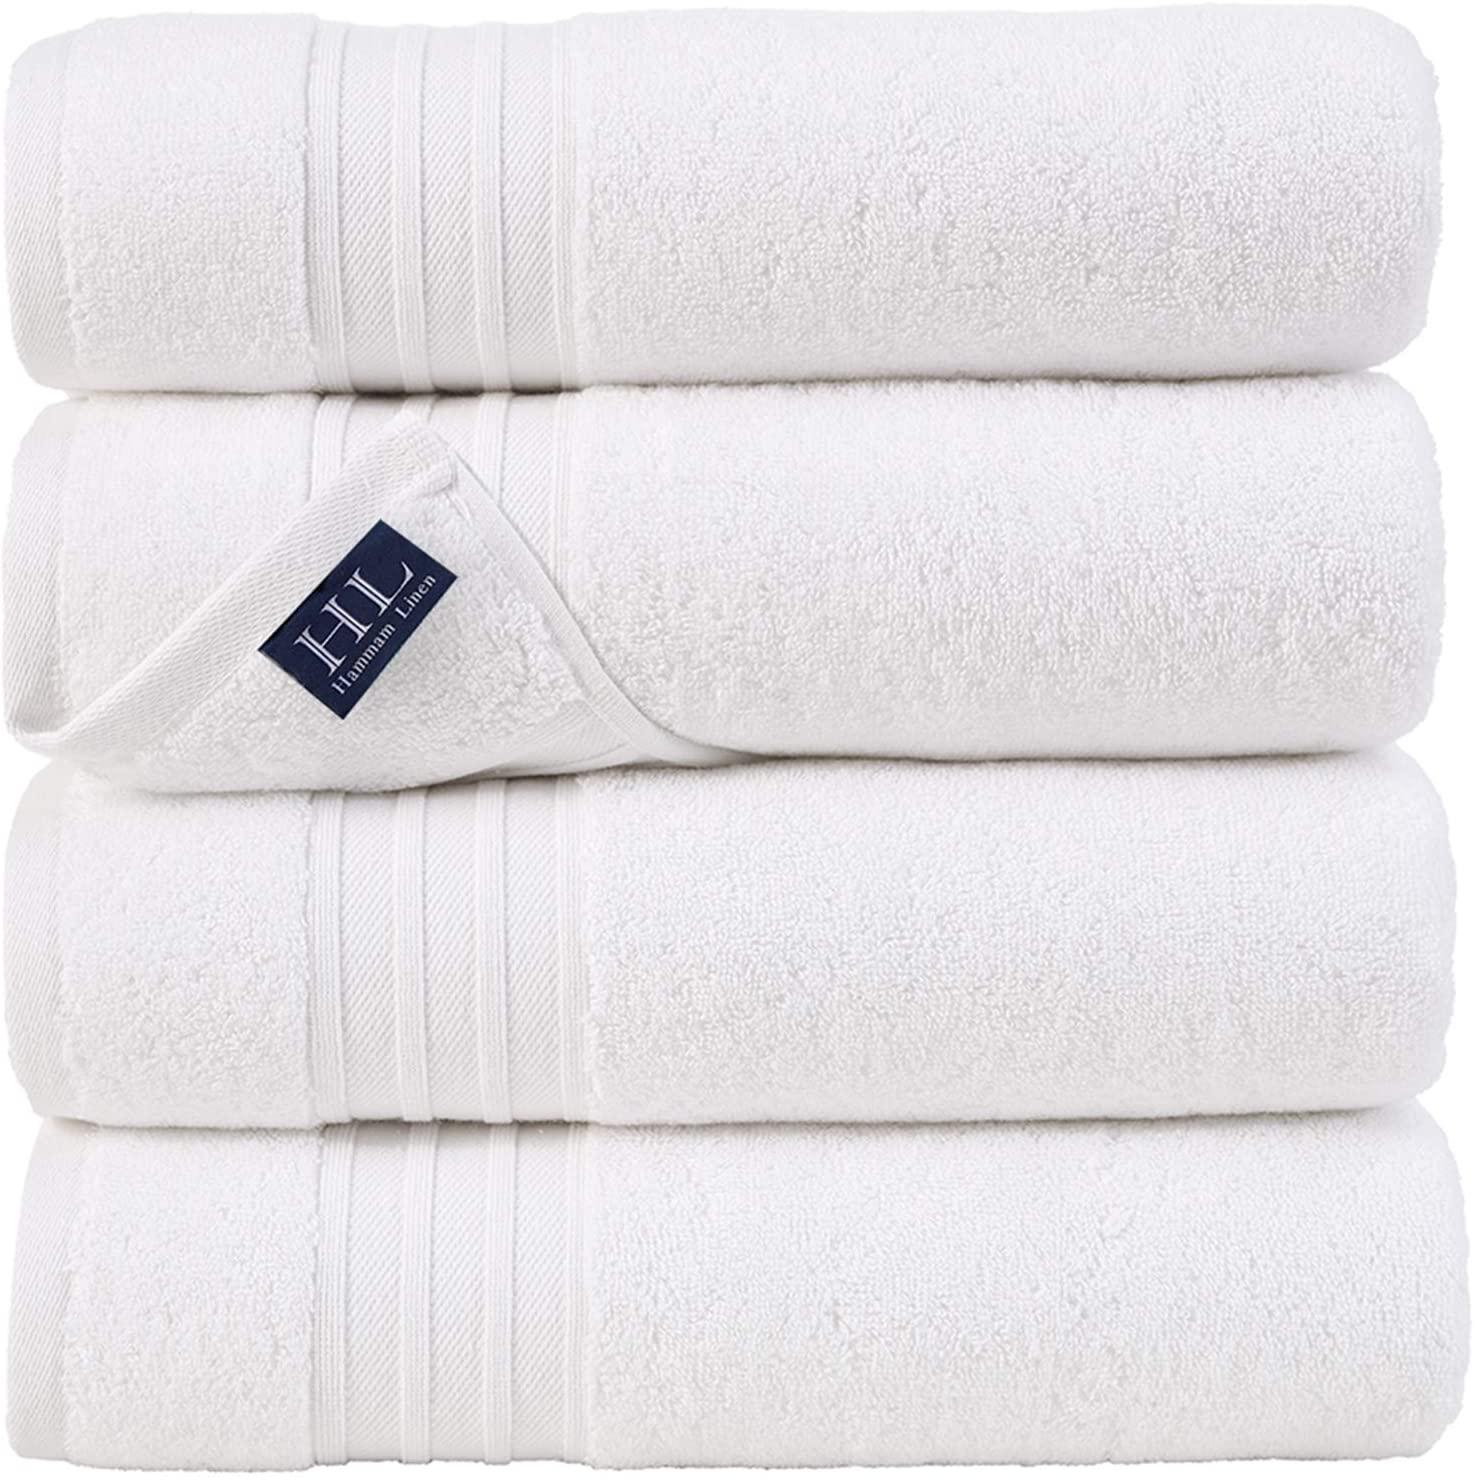 Hammam Linen White Bath Towels 4-Pack